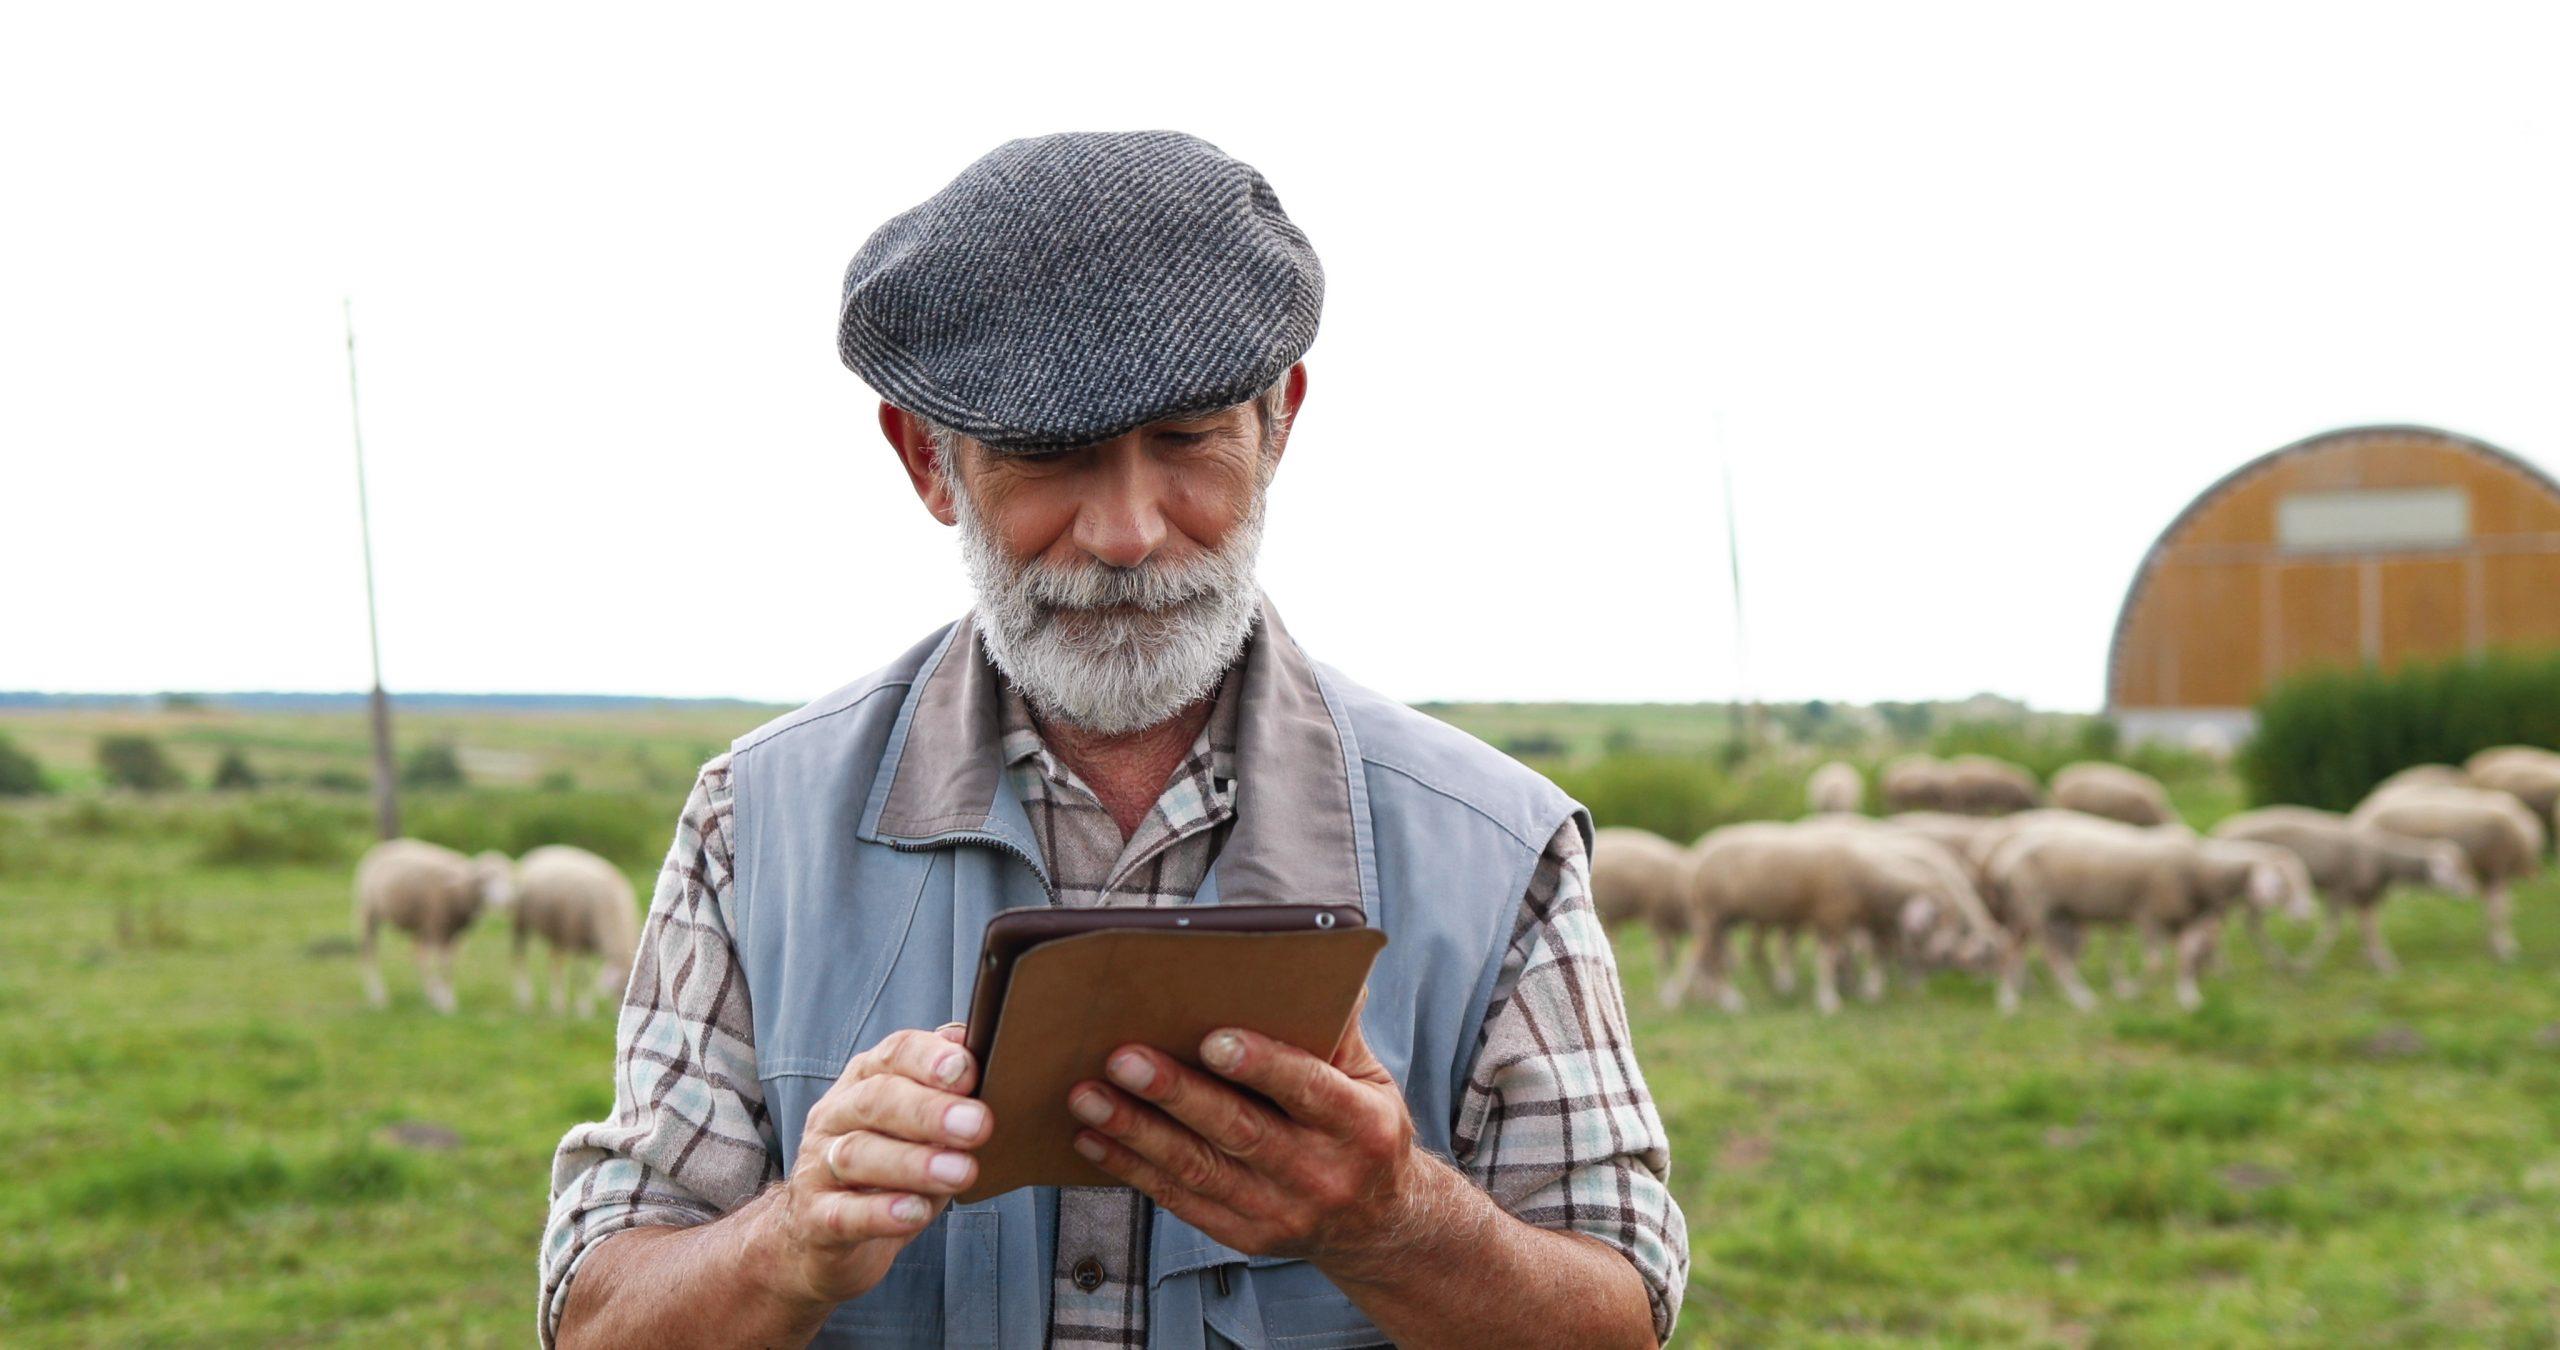 Farmer using iPad technology in a field of sheep